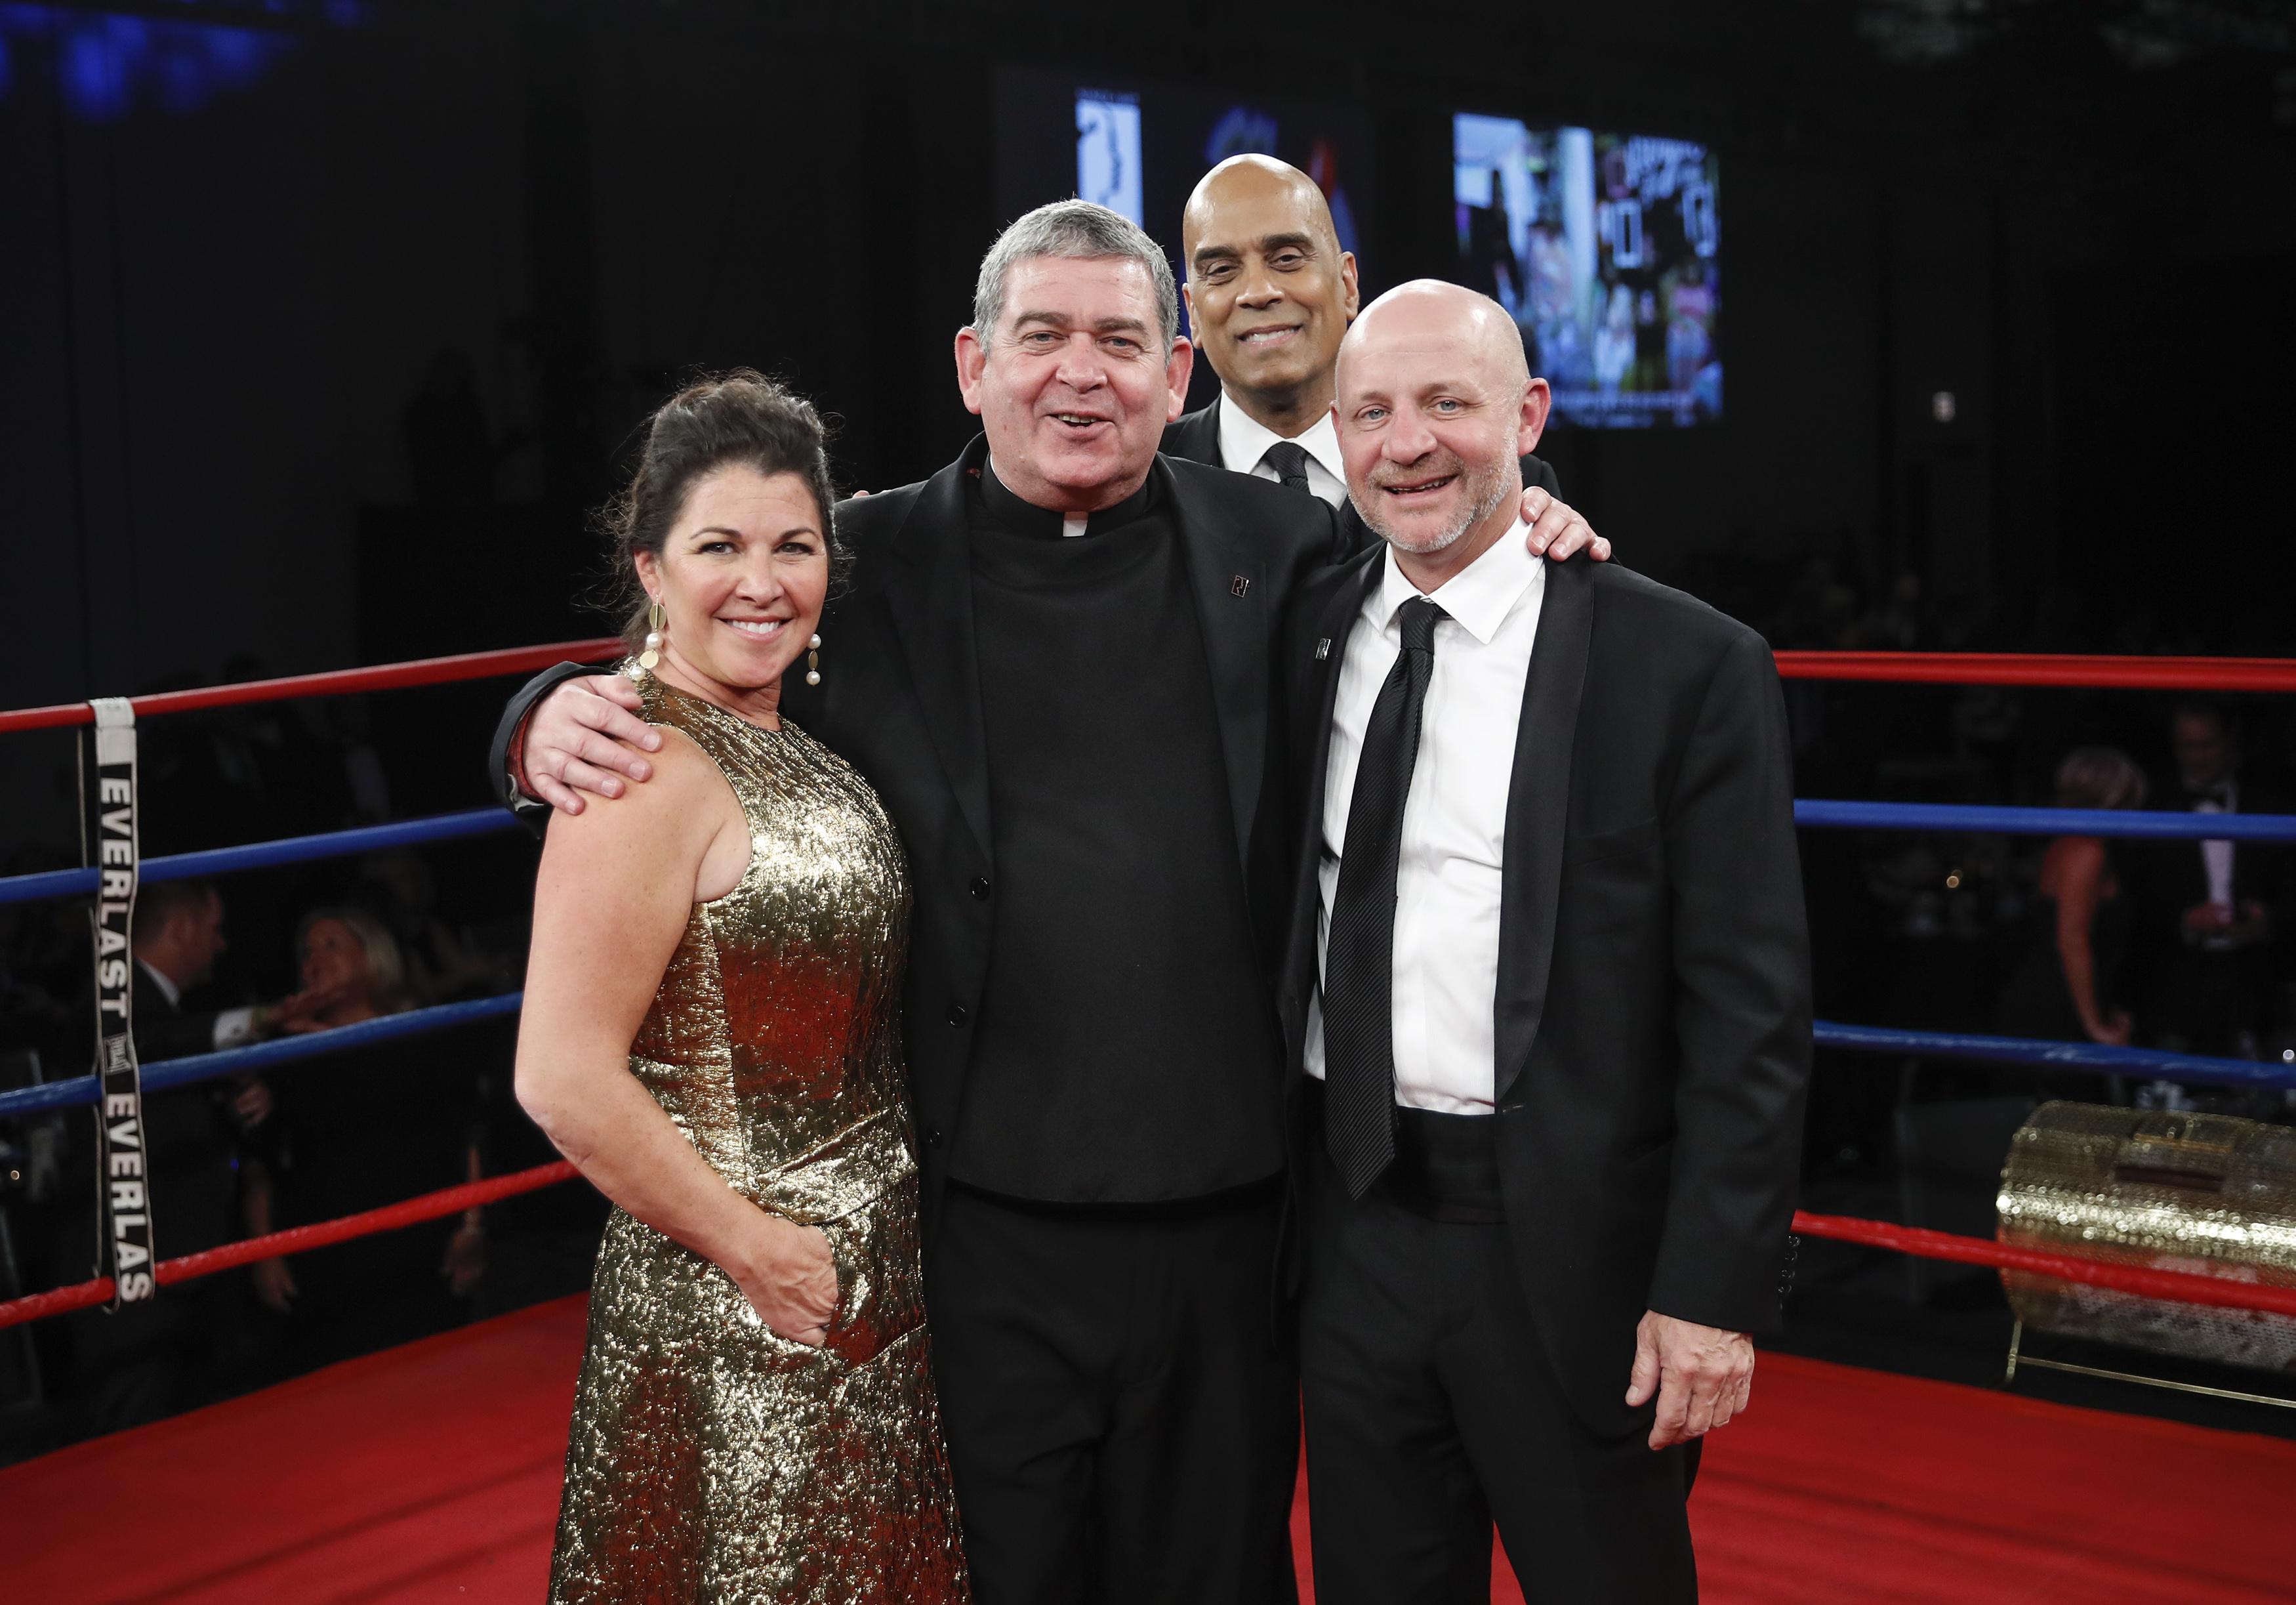 Johanna Rahal, Fr. Scott Donahue, Joe Nolan, and Jim Williams